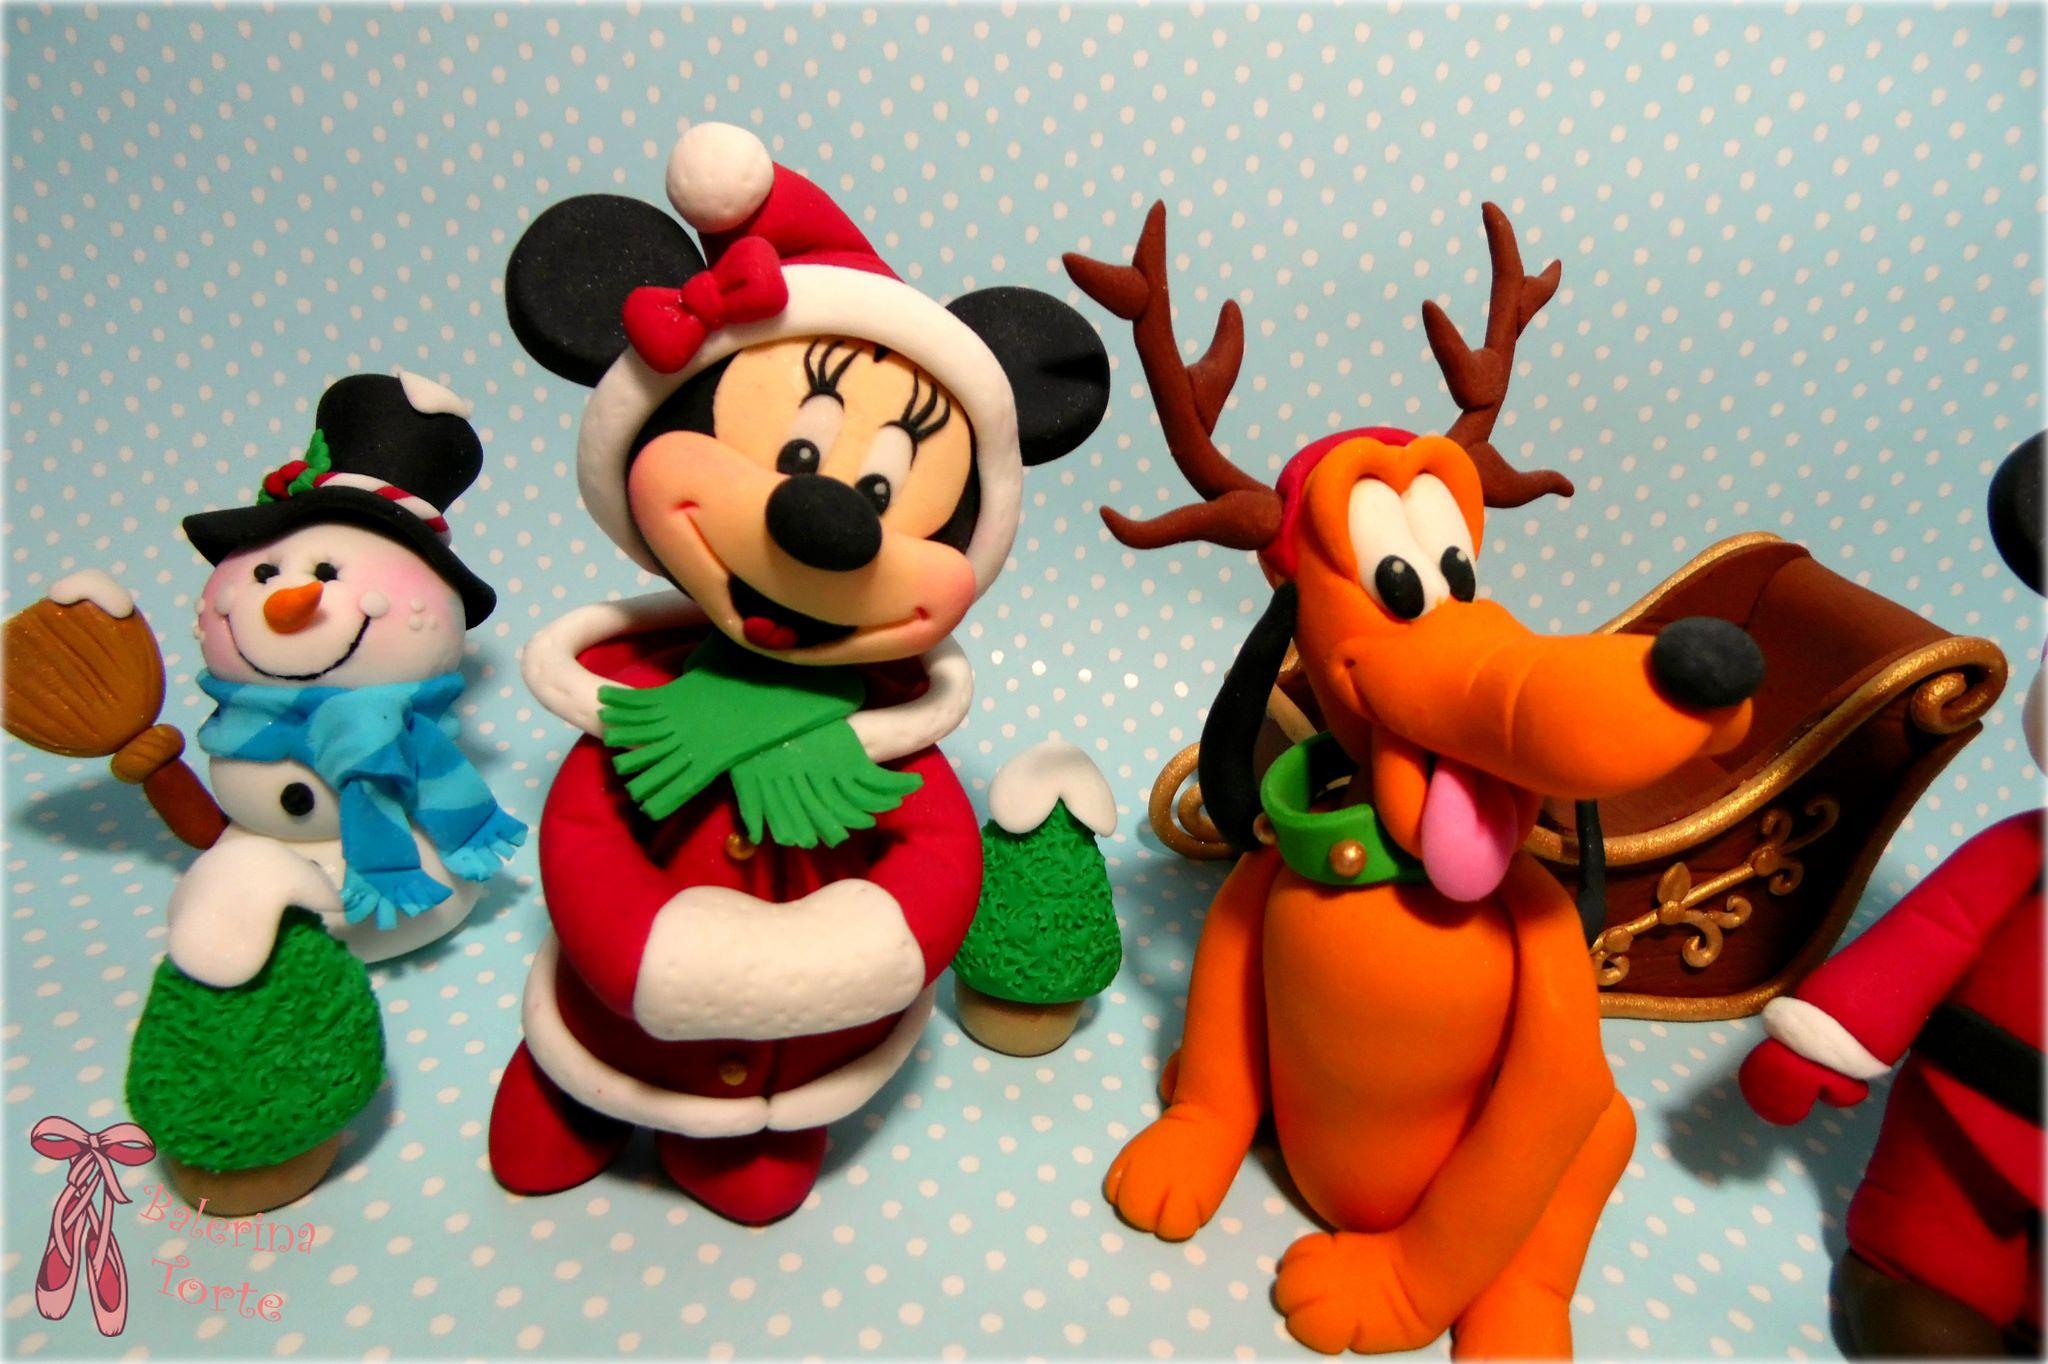 Disney Mickey and Minnie Mouse lovely Christmas cake – Miki i Mini Maus novogodisnja torta by Balerina Jagodina